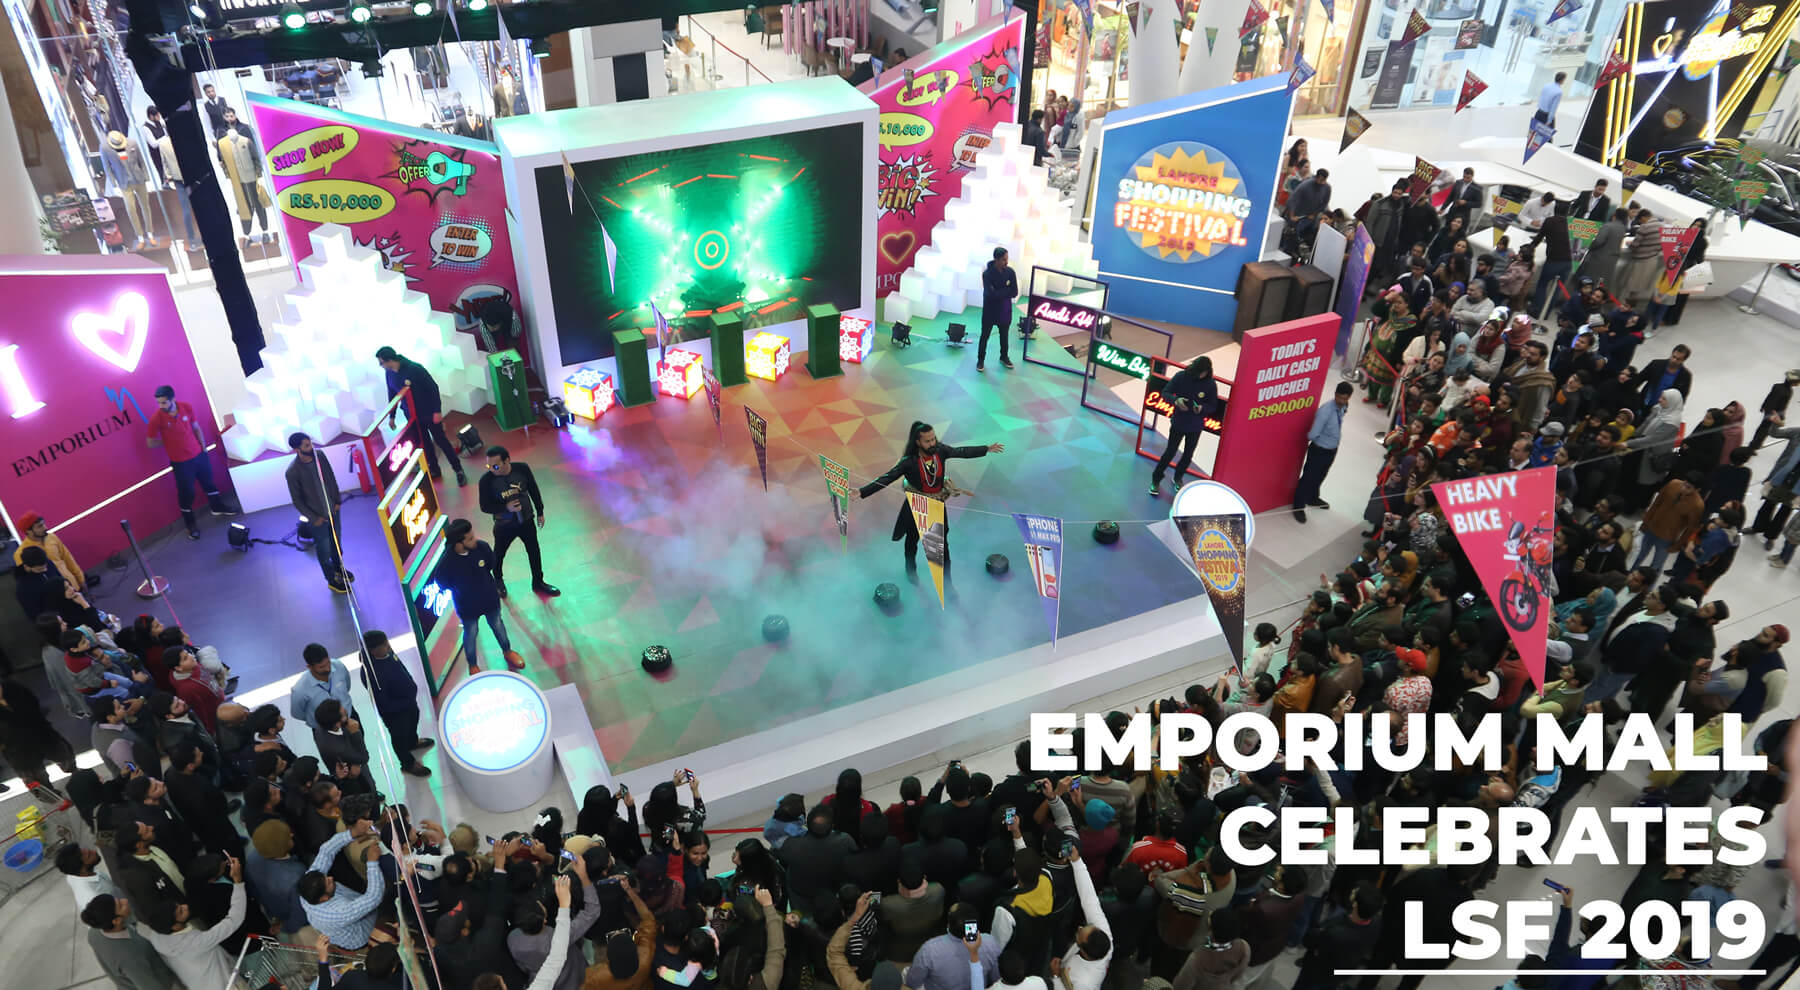 LSF Exhibition Emporium Mall